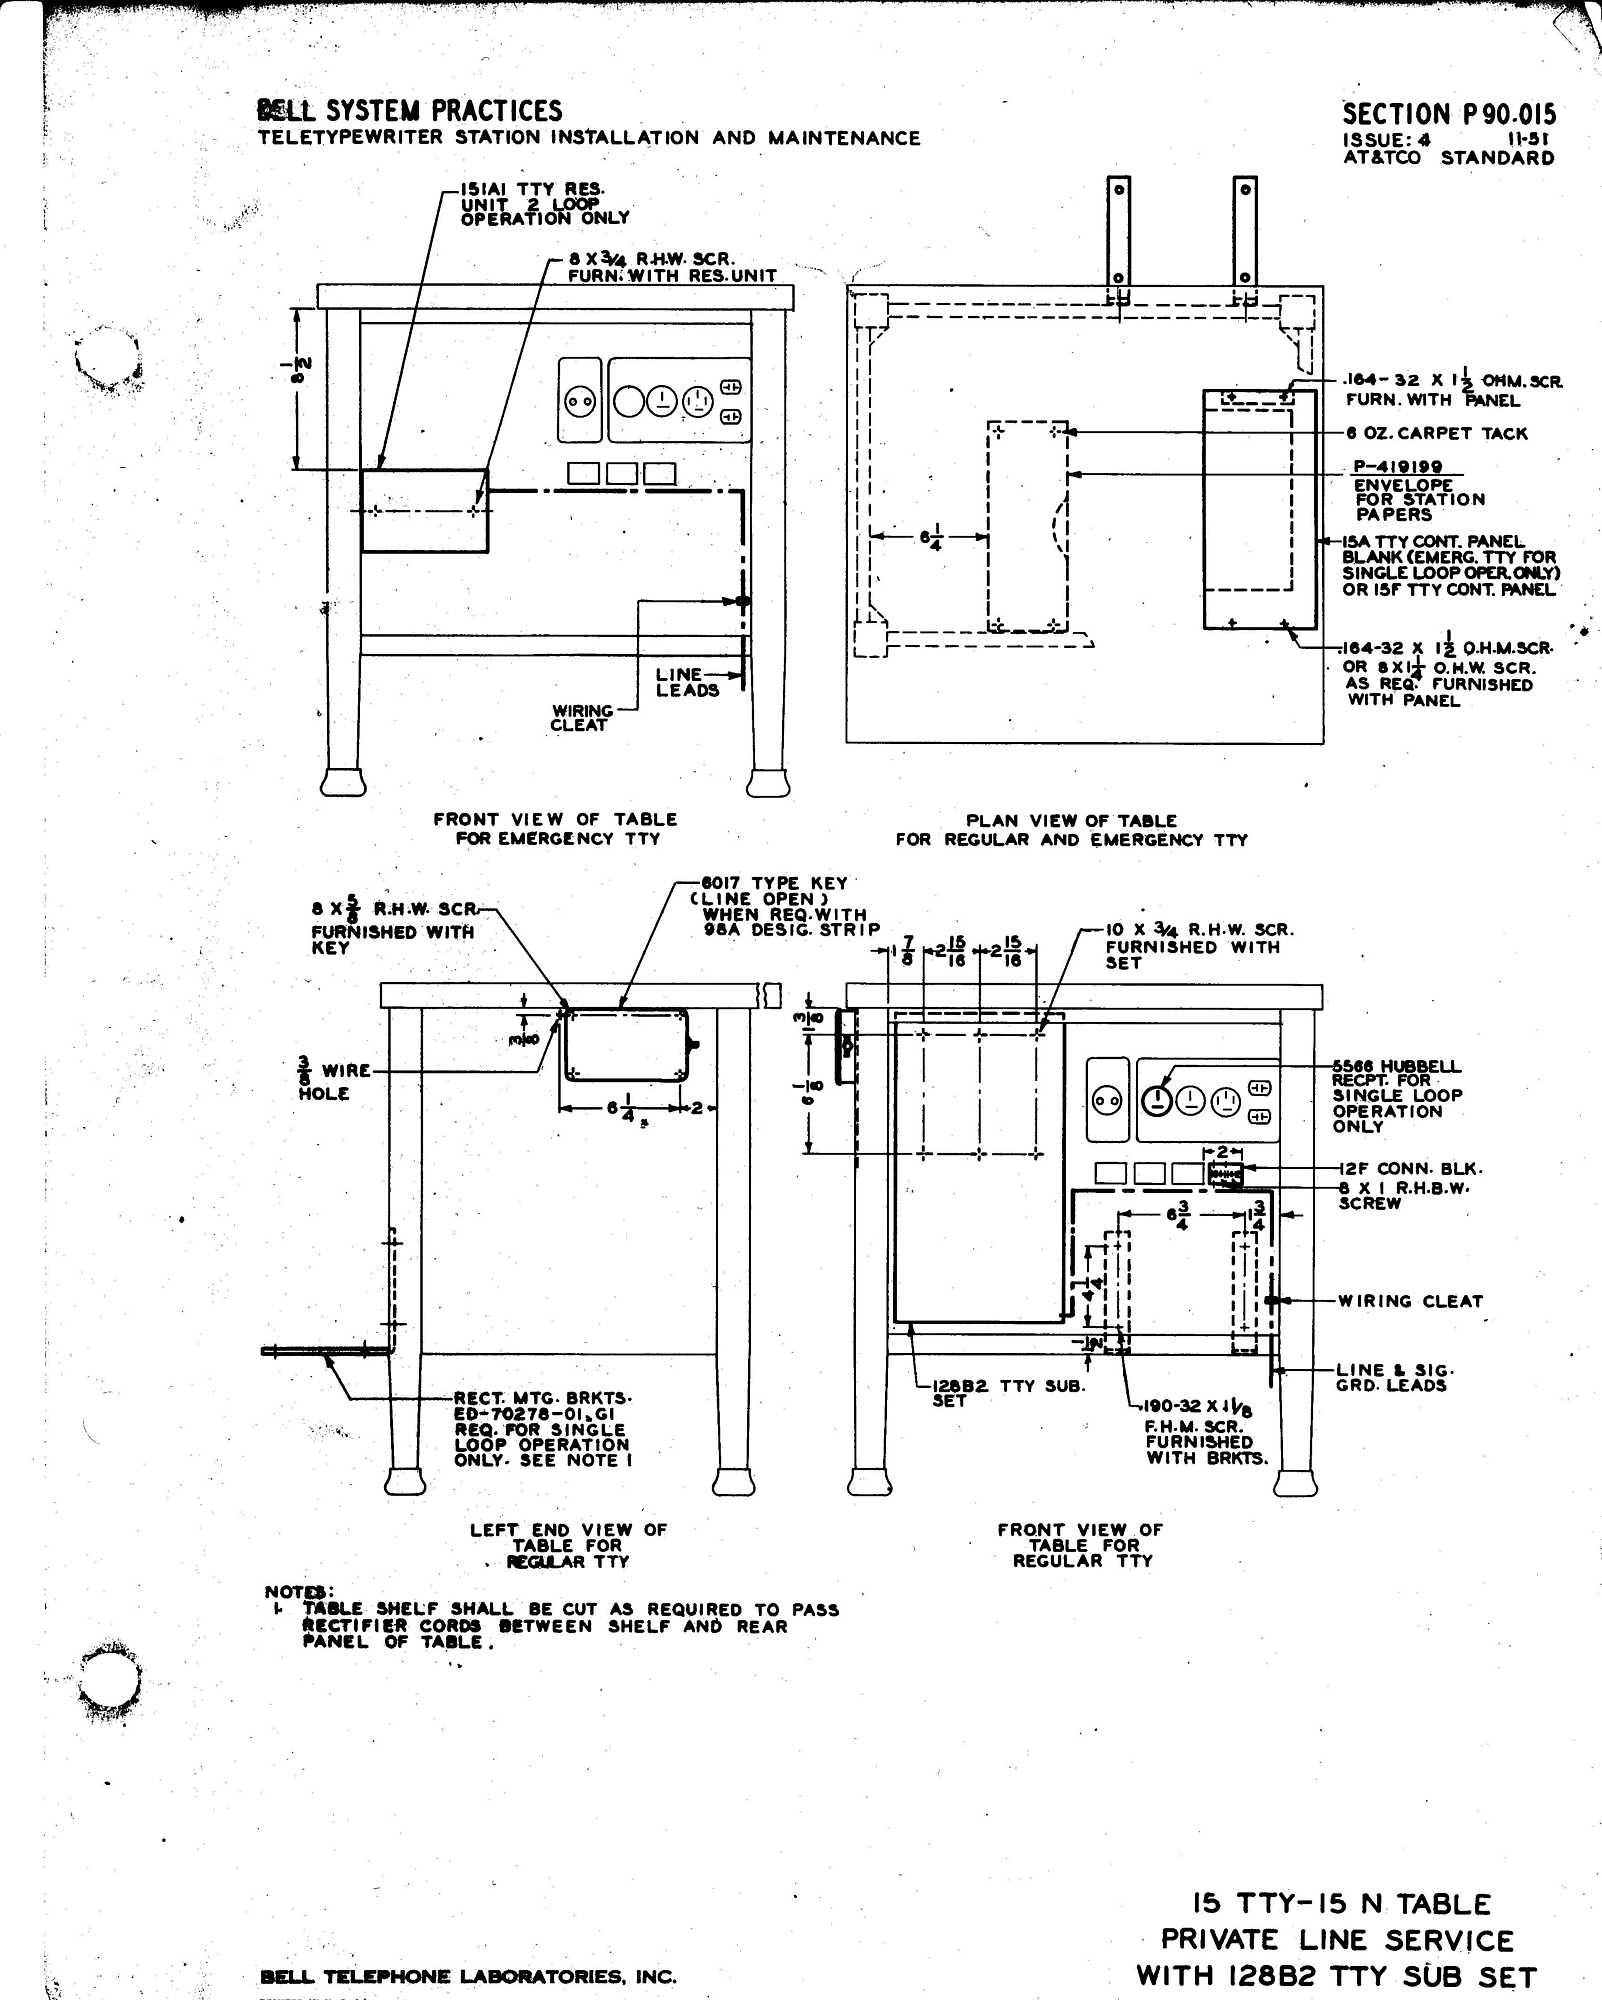 hyundai h 842hl wiring harness - wiring diagrams  week.need.lesvignoblesguimberteau.fr